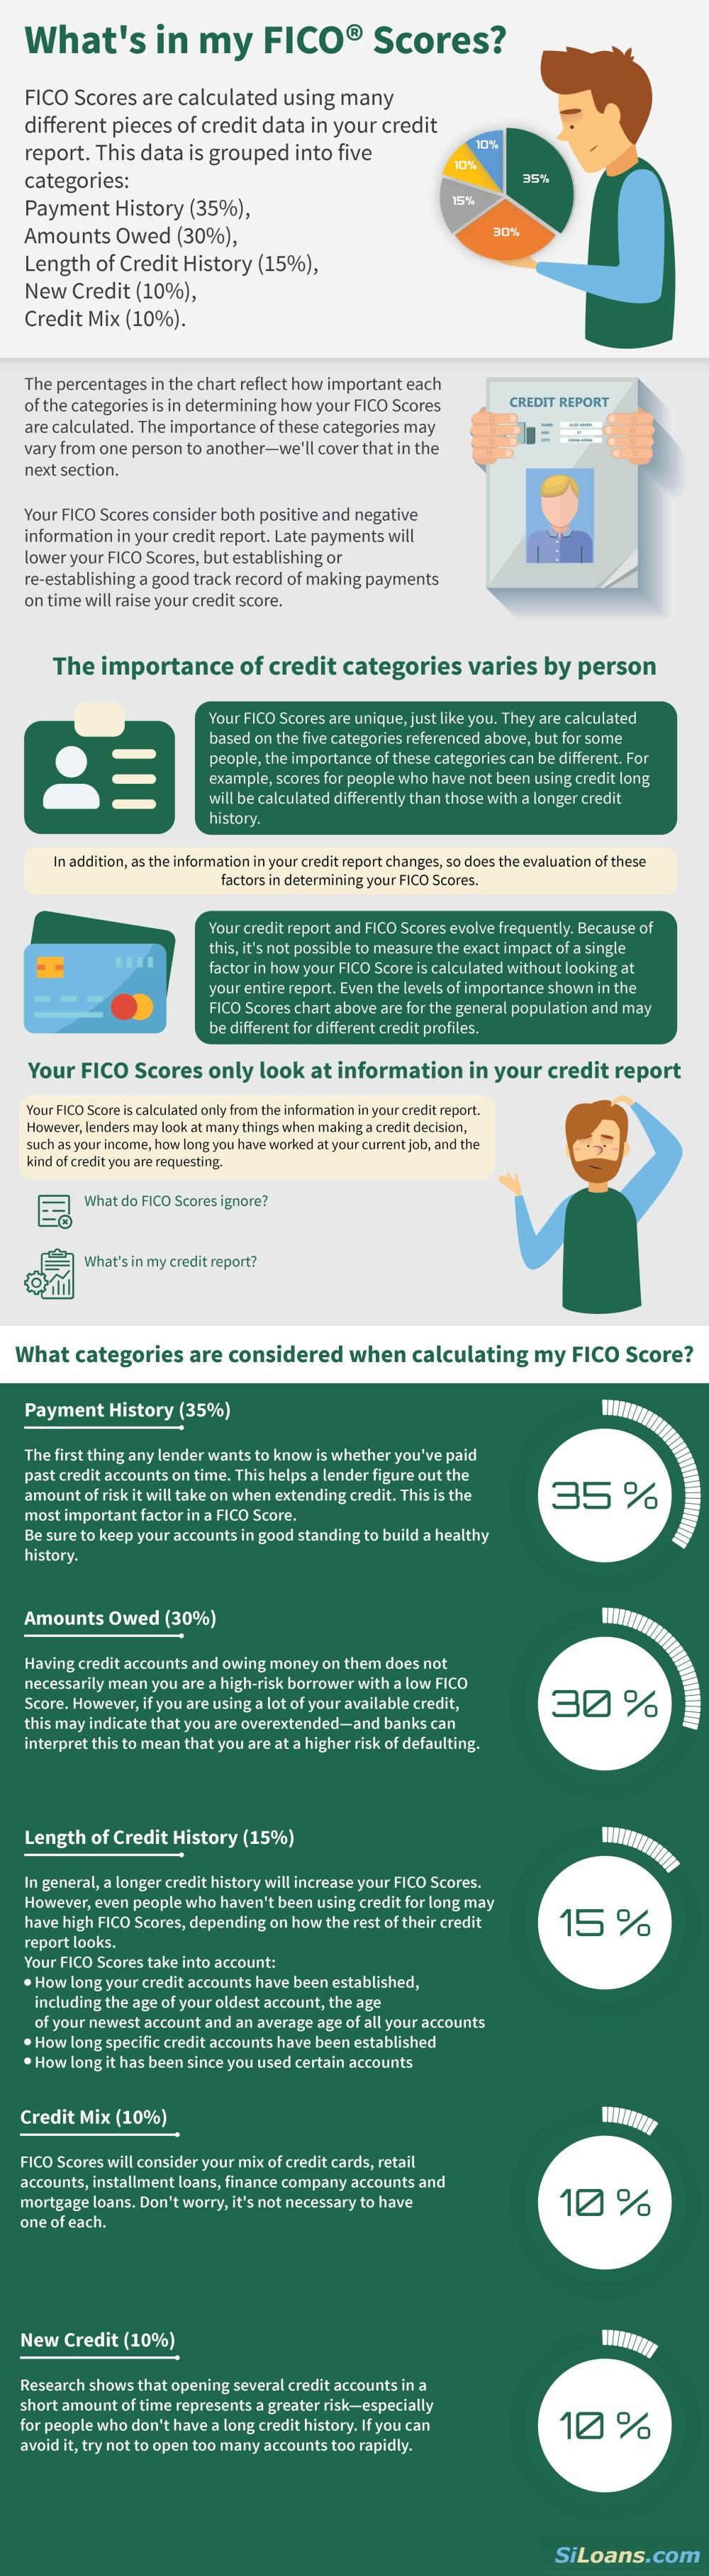 fico score infographic